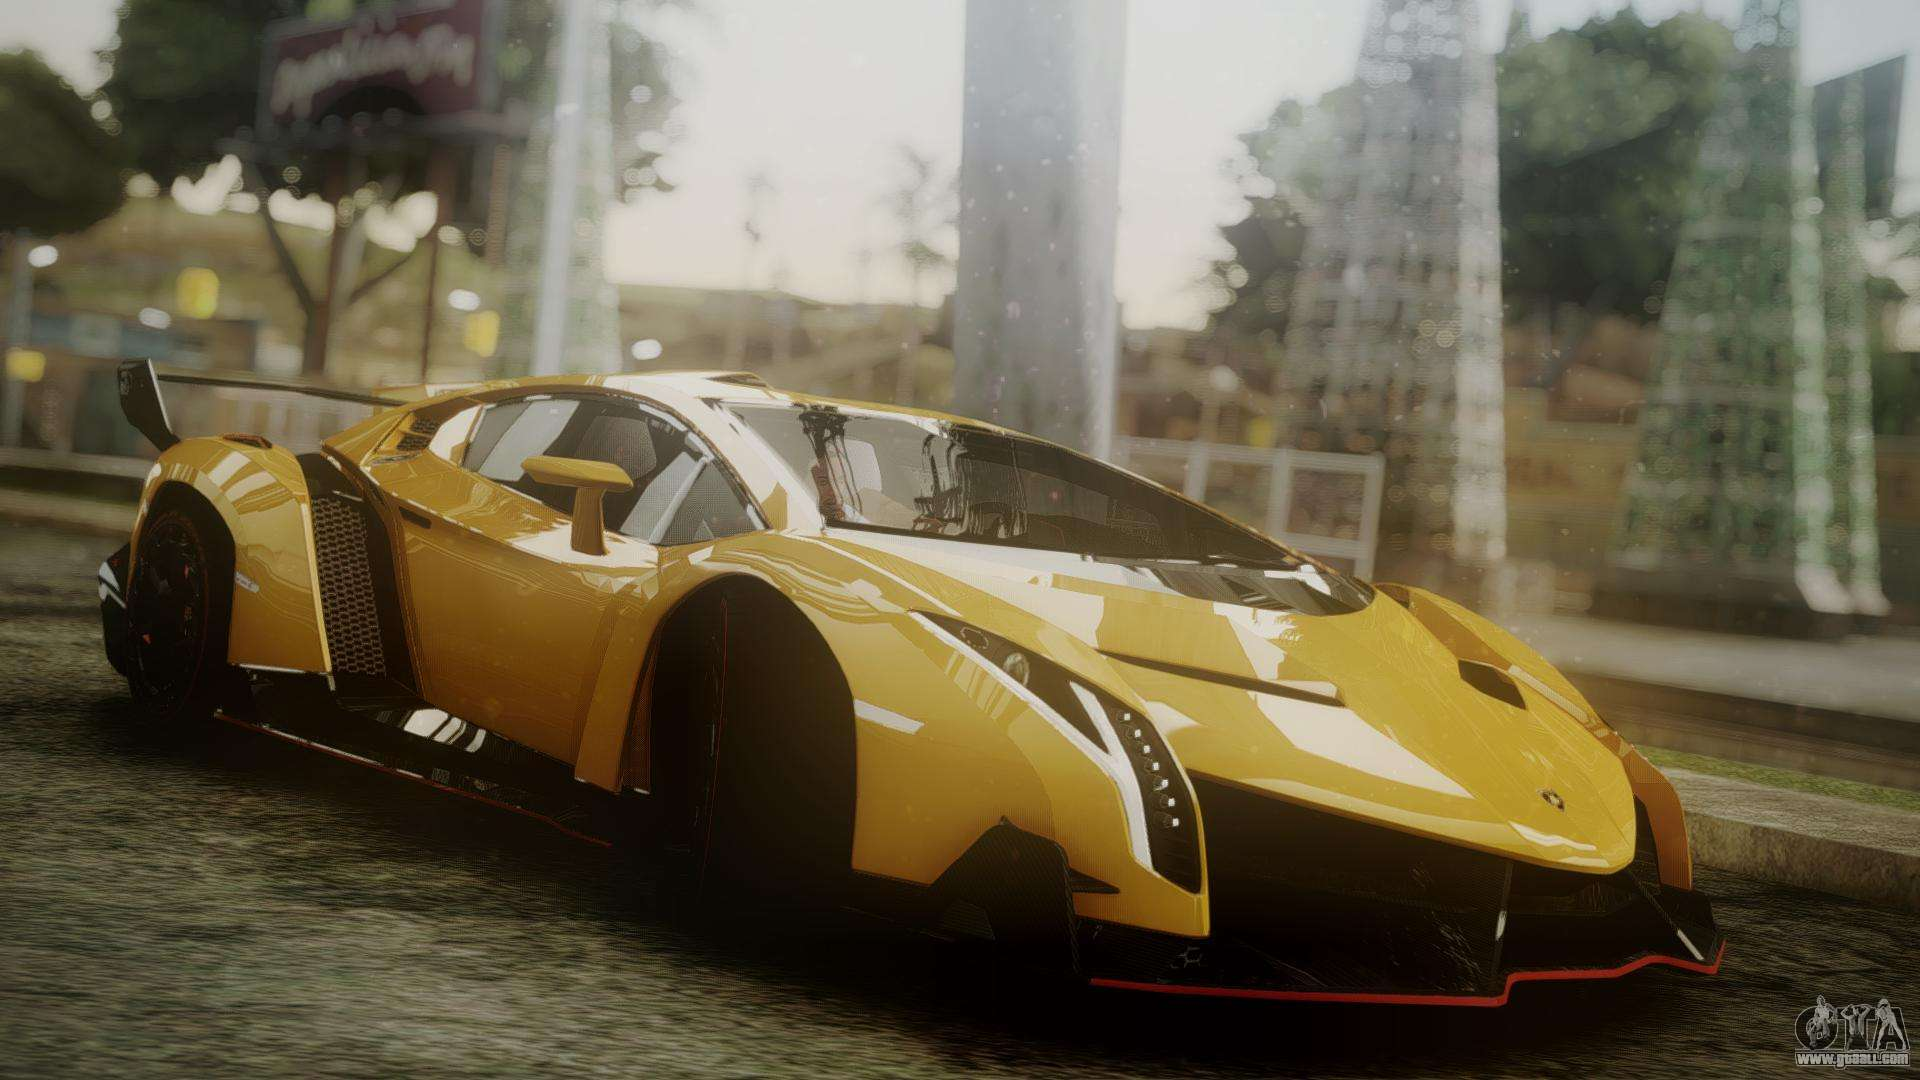 Lamborghini Veneno for GTA San Andreas for Lamborghini Veneno Gold  165jwn